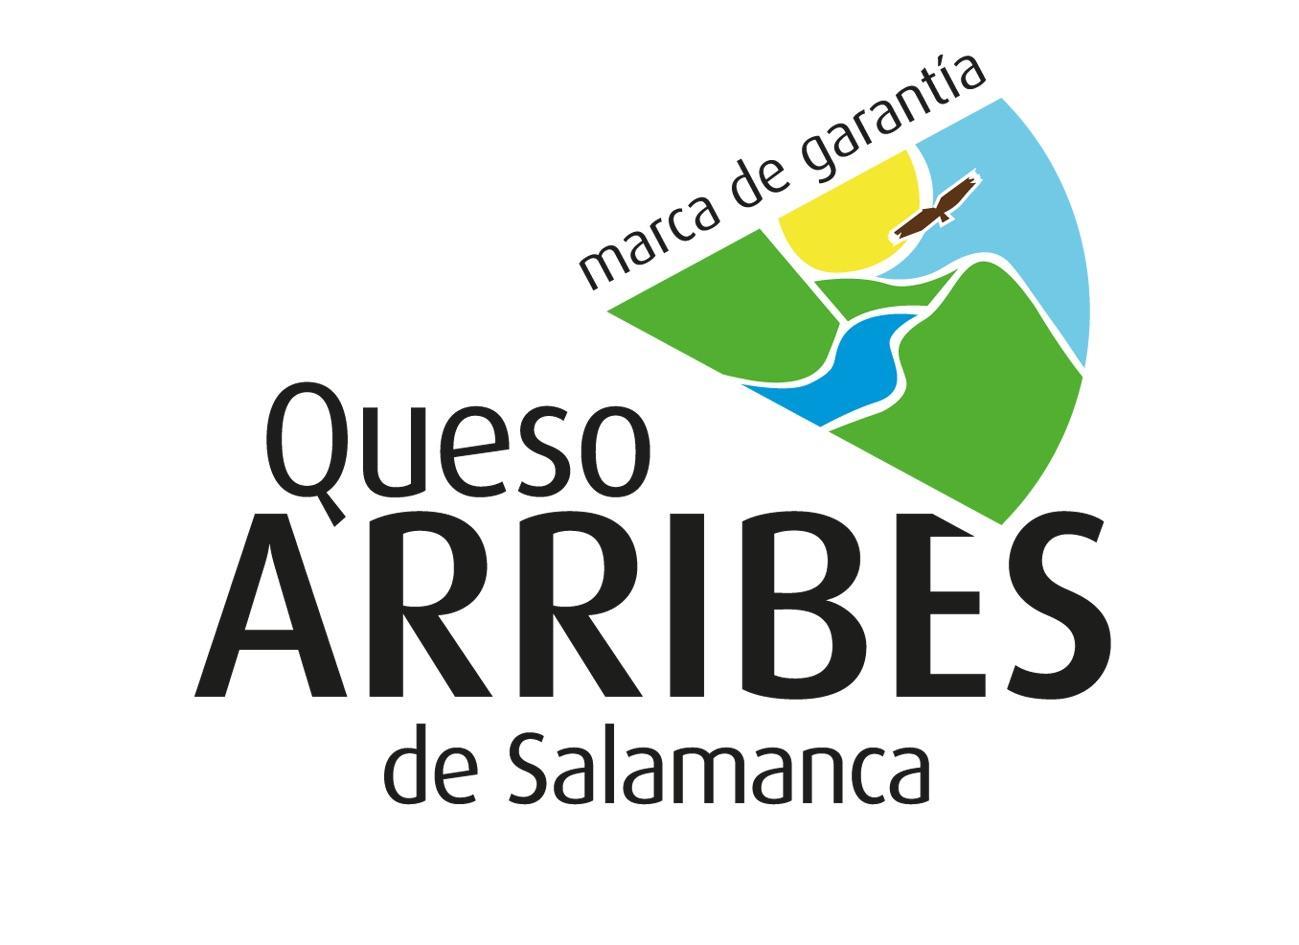 M.G. Queso Arribes de Salamanca